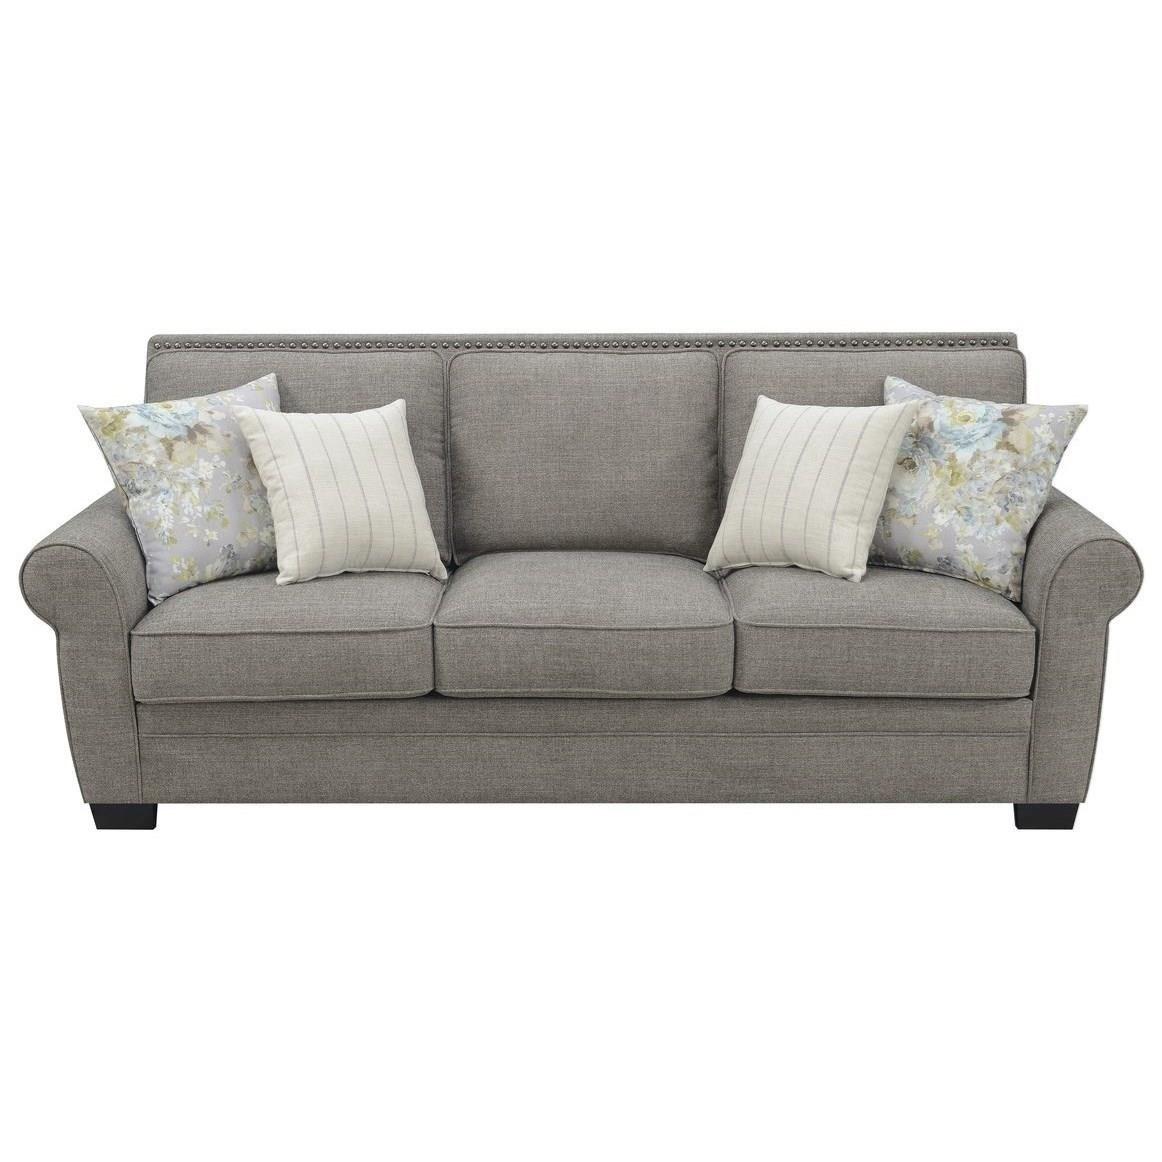 Sofa W/4 Accent Pillows